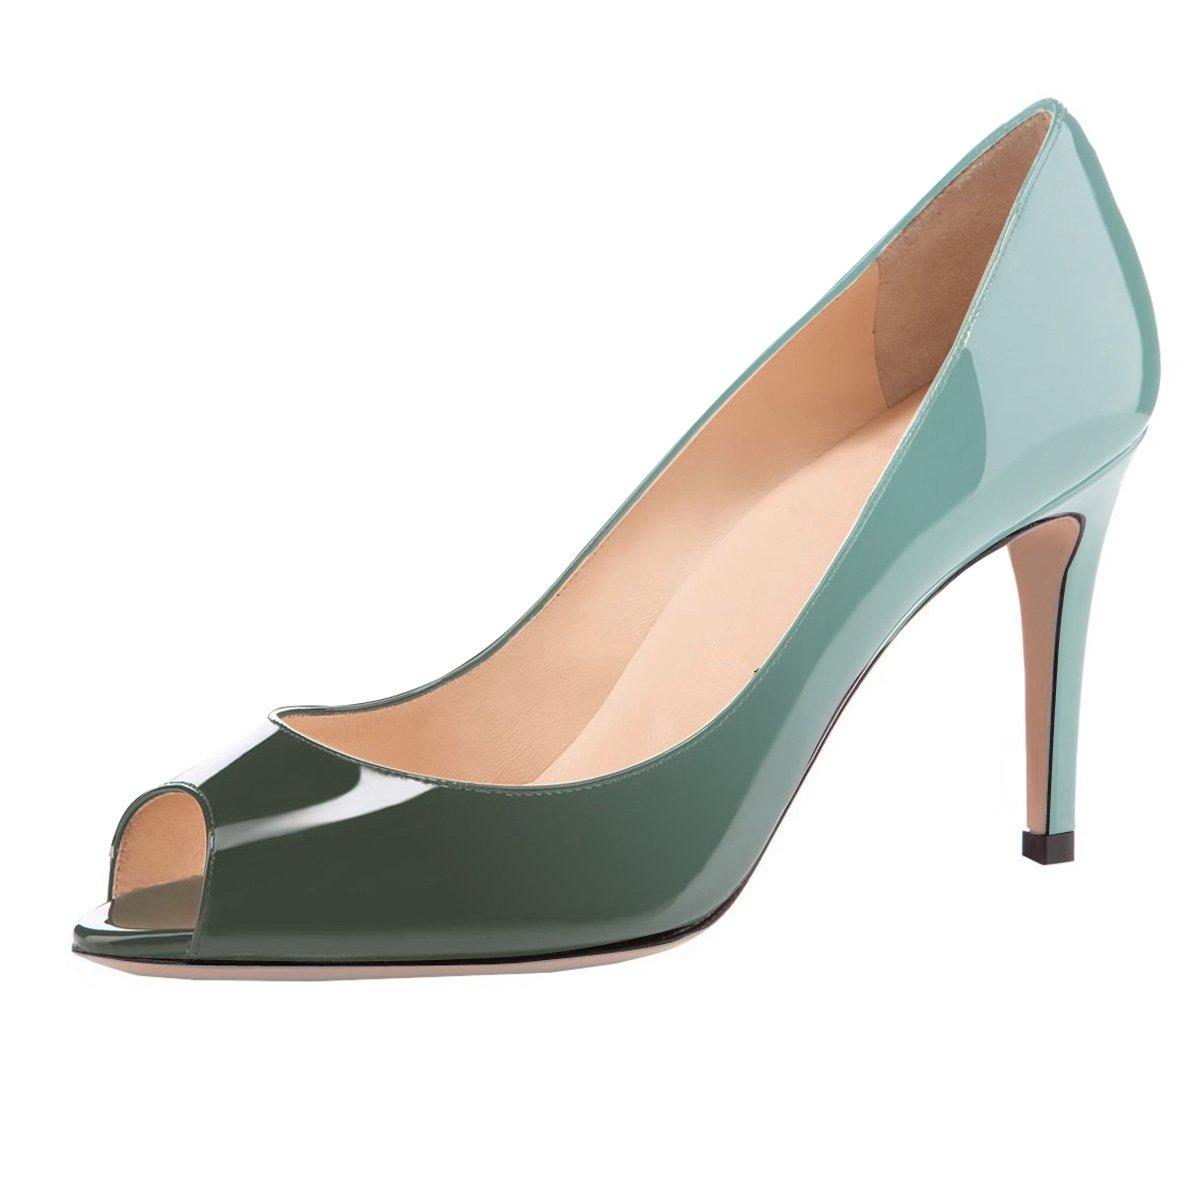 Eldof Women Peep Toe Pumps Mid-Heel Pumps Formal Wedding Bridal Classic Heel Open Toe Stiletto B07F8QHDC6 5.5 B(M) US|Emerald